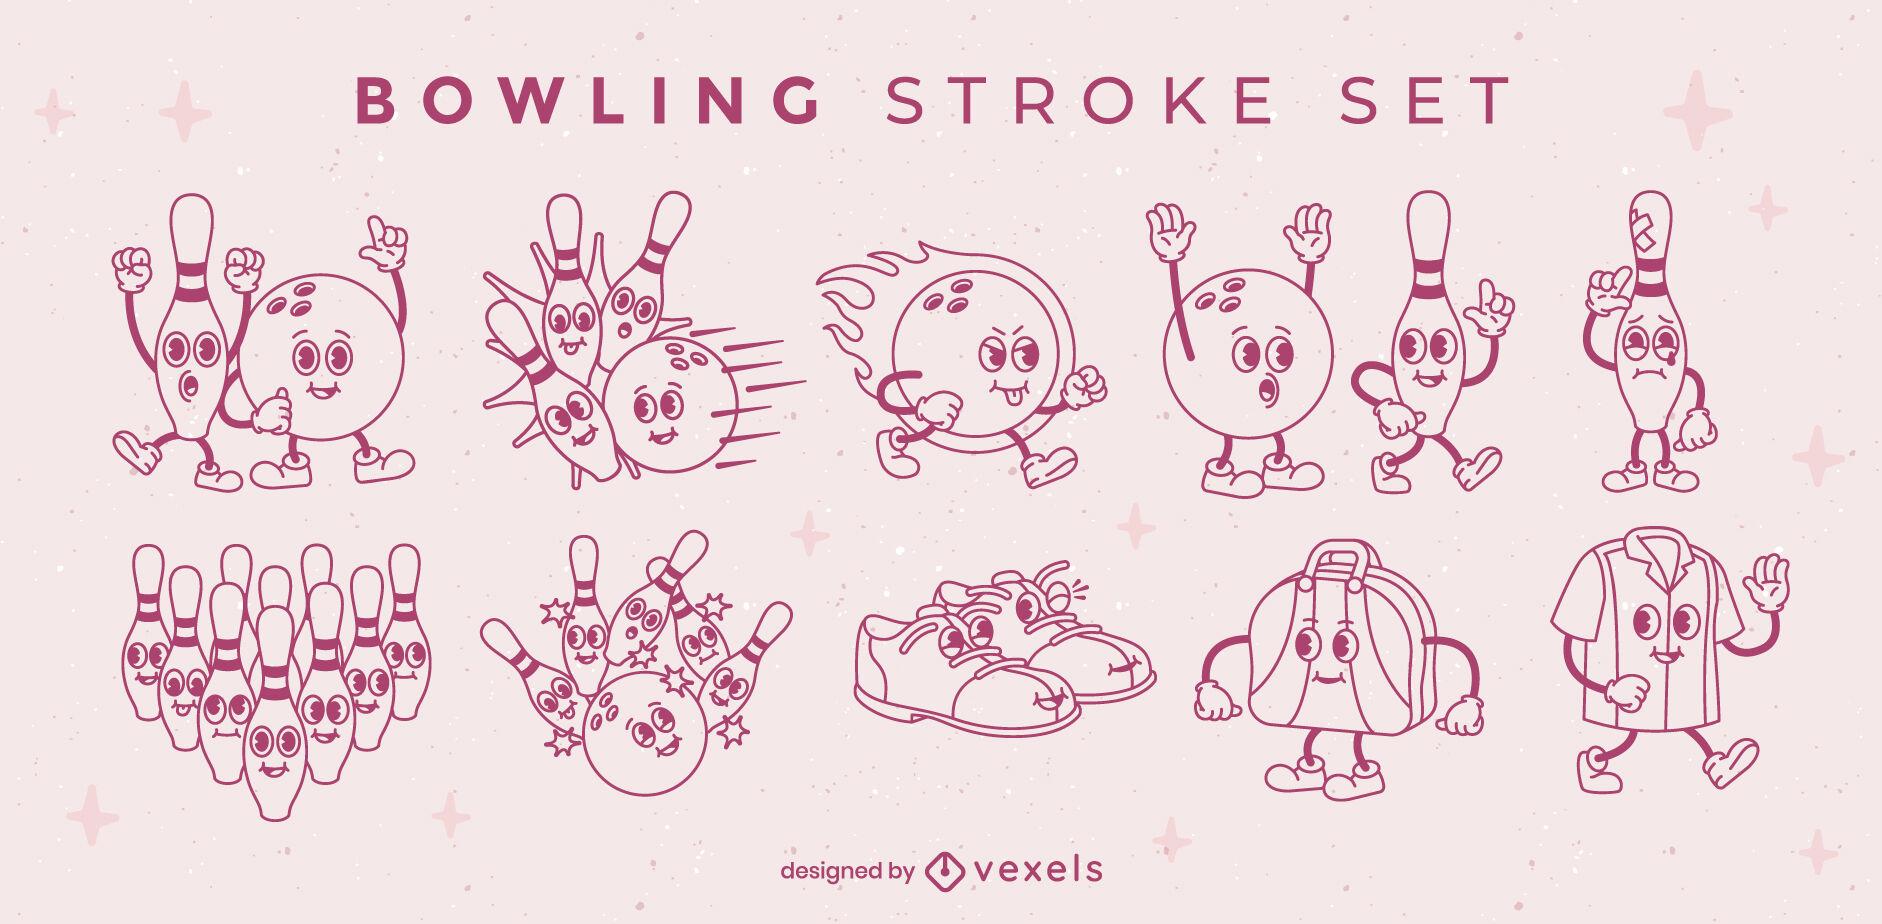 Bowling characters retro cartoon stroke